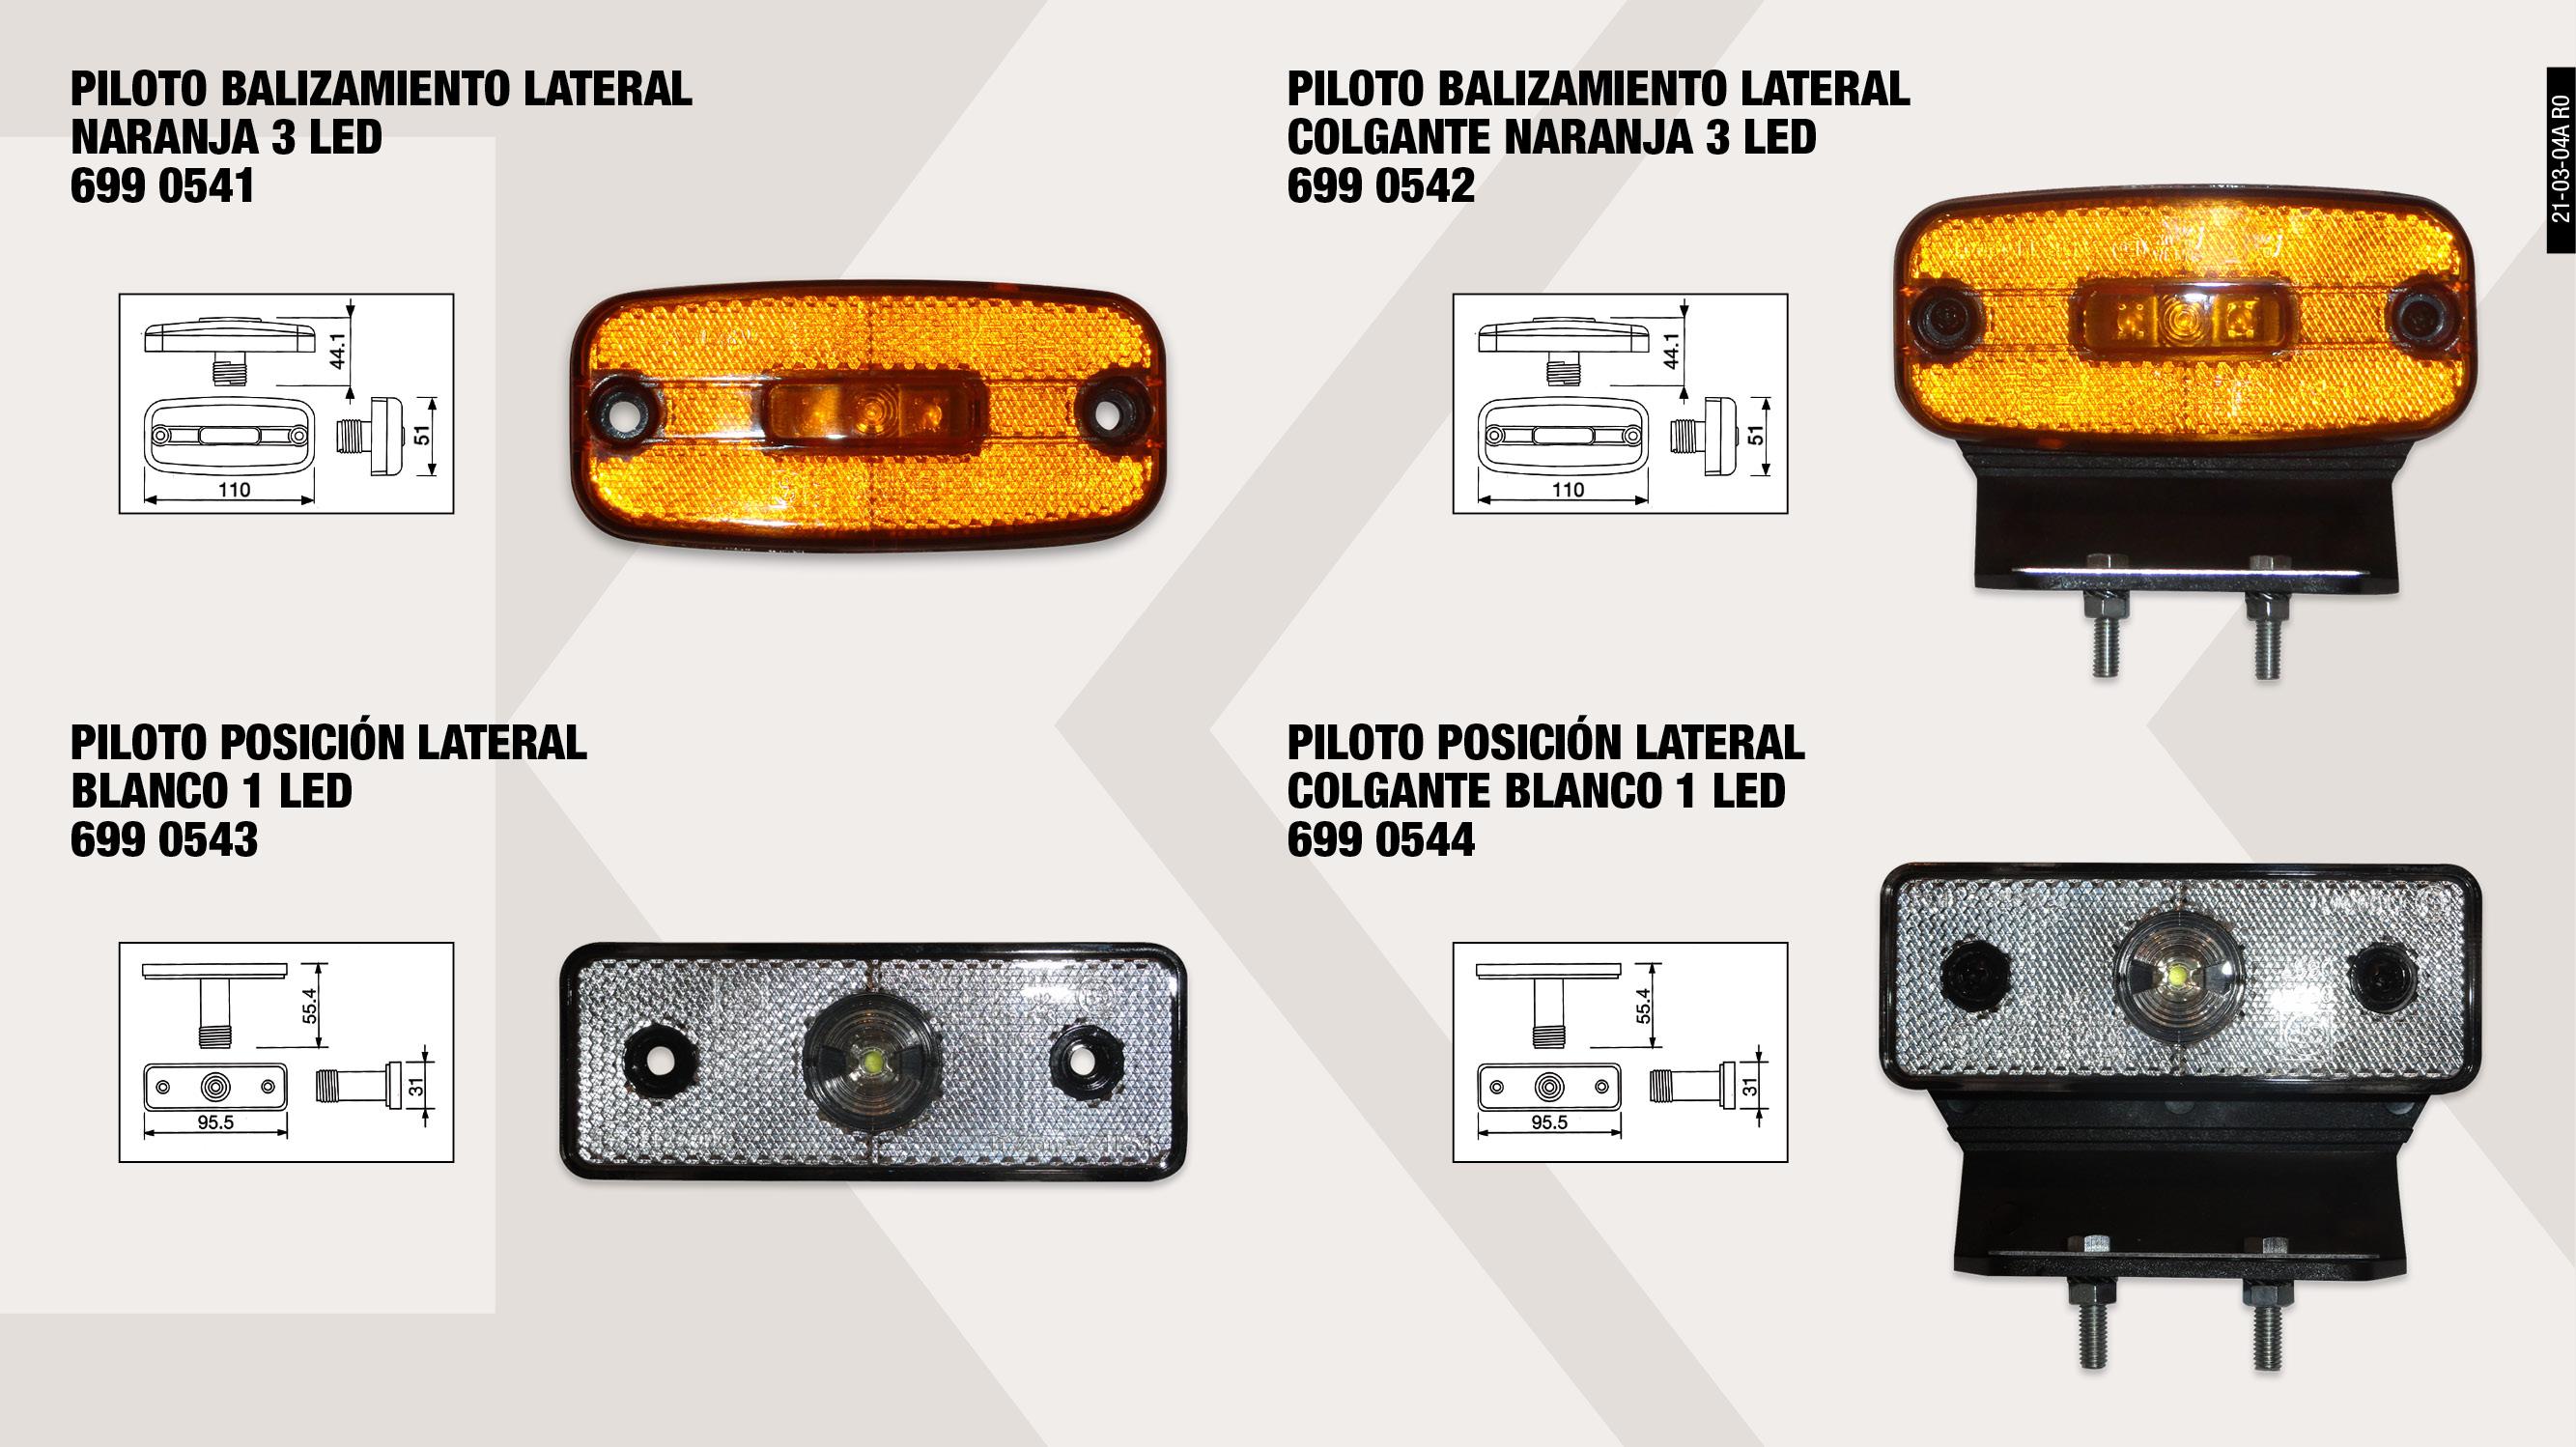 PILOTO POSICION LATERAL COLGANTE BLANCO 1 LED               ,  PILOTO BALIZAM.LATERAL COLGANTE NARANJA 3 LEDS              ,  PILOTO BALAZAM.LATERAL NARANJA 3 LEDS                       ,  PILOTO POSICION LATERAL BLANCO 1 LED                        ,